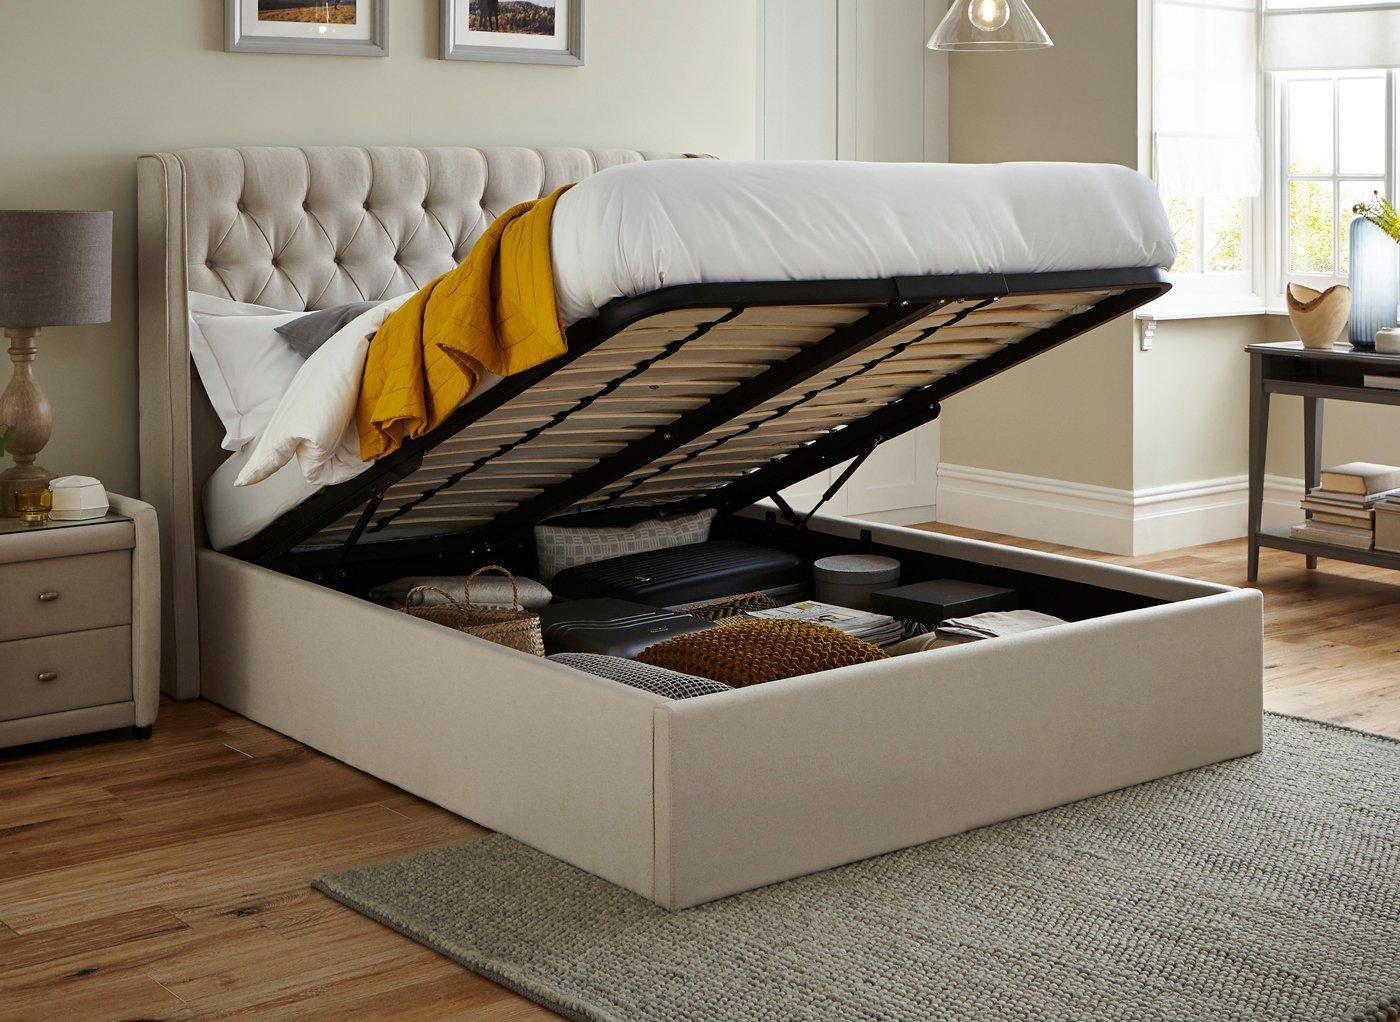 deacon-upholstered-ottoman-bed-frame